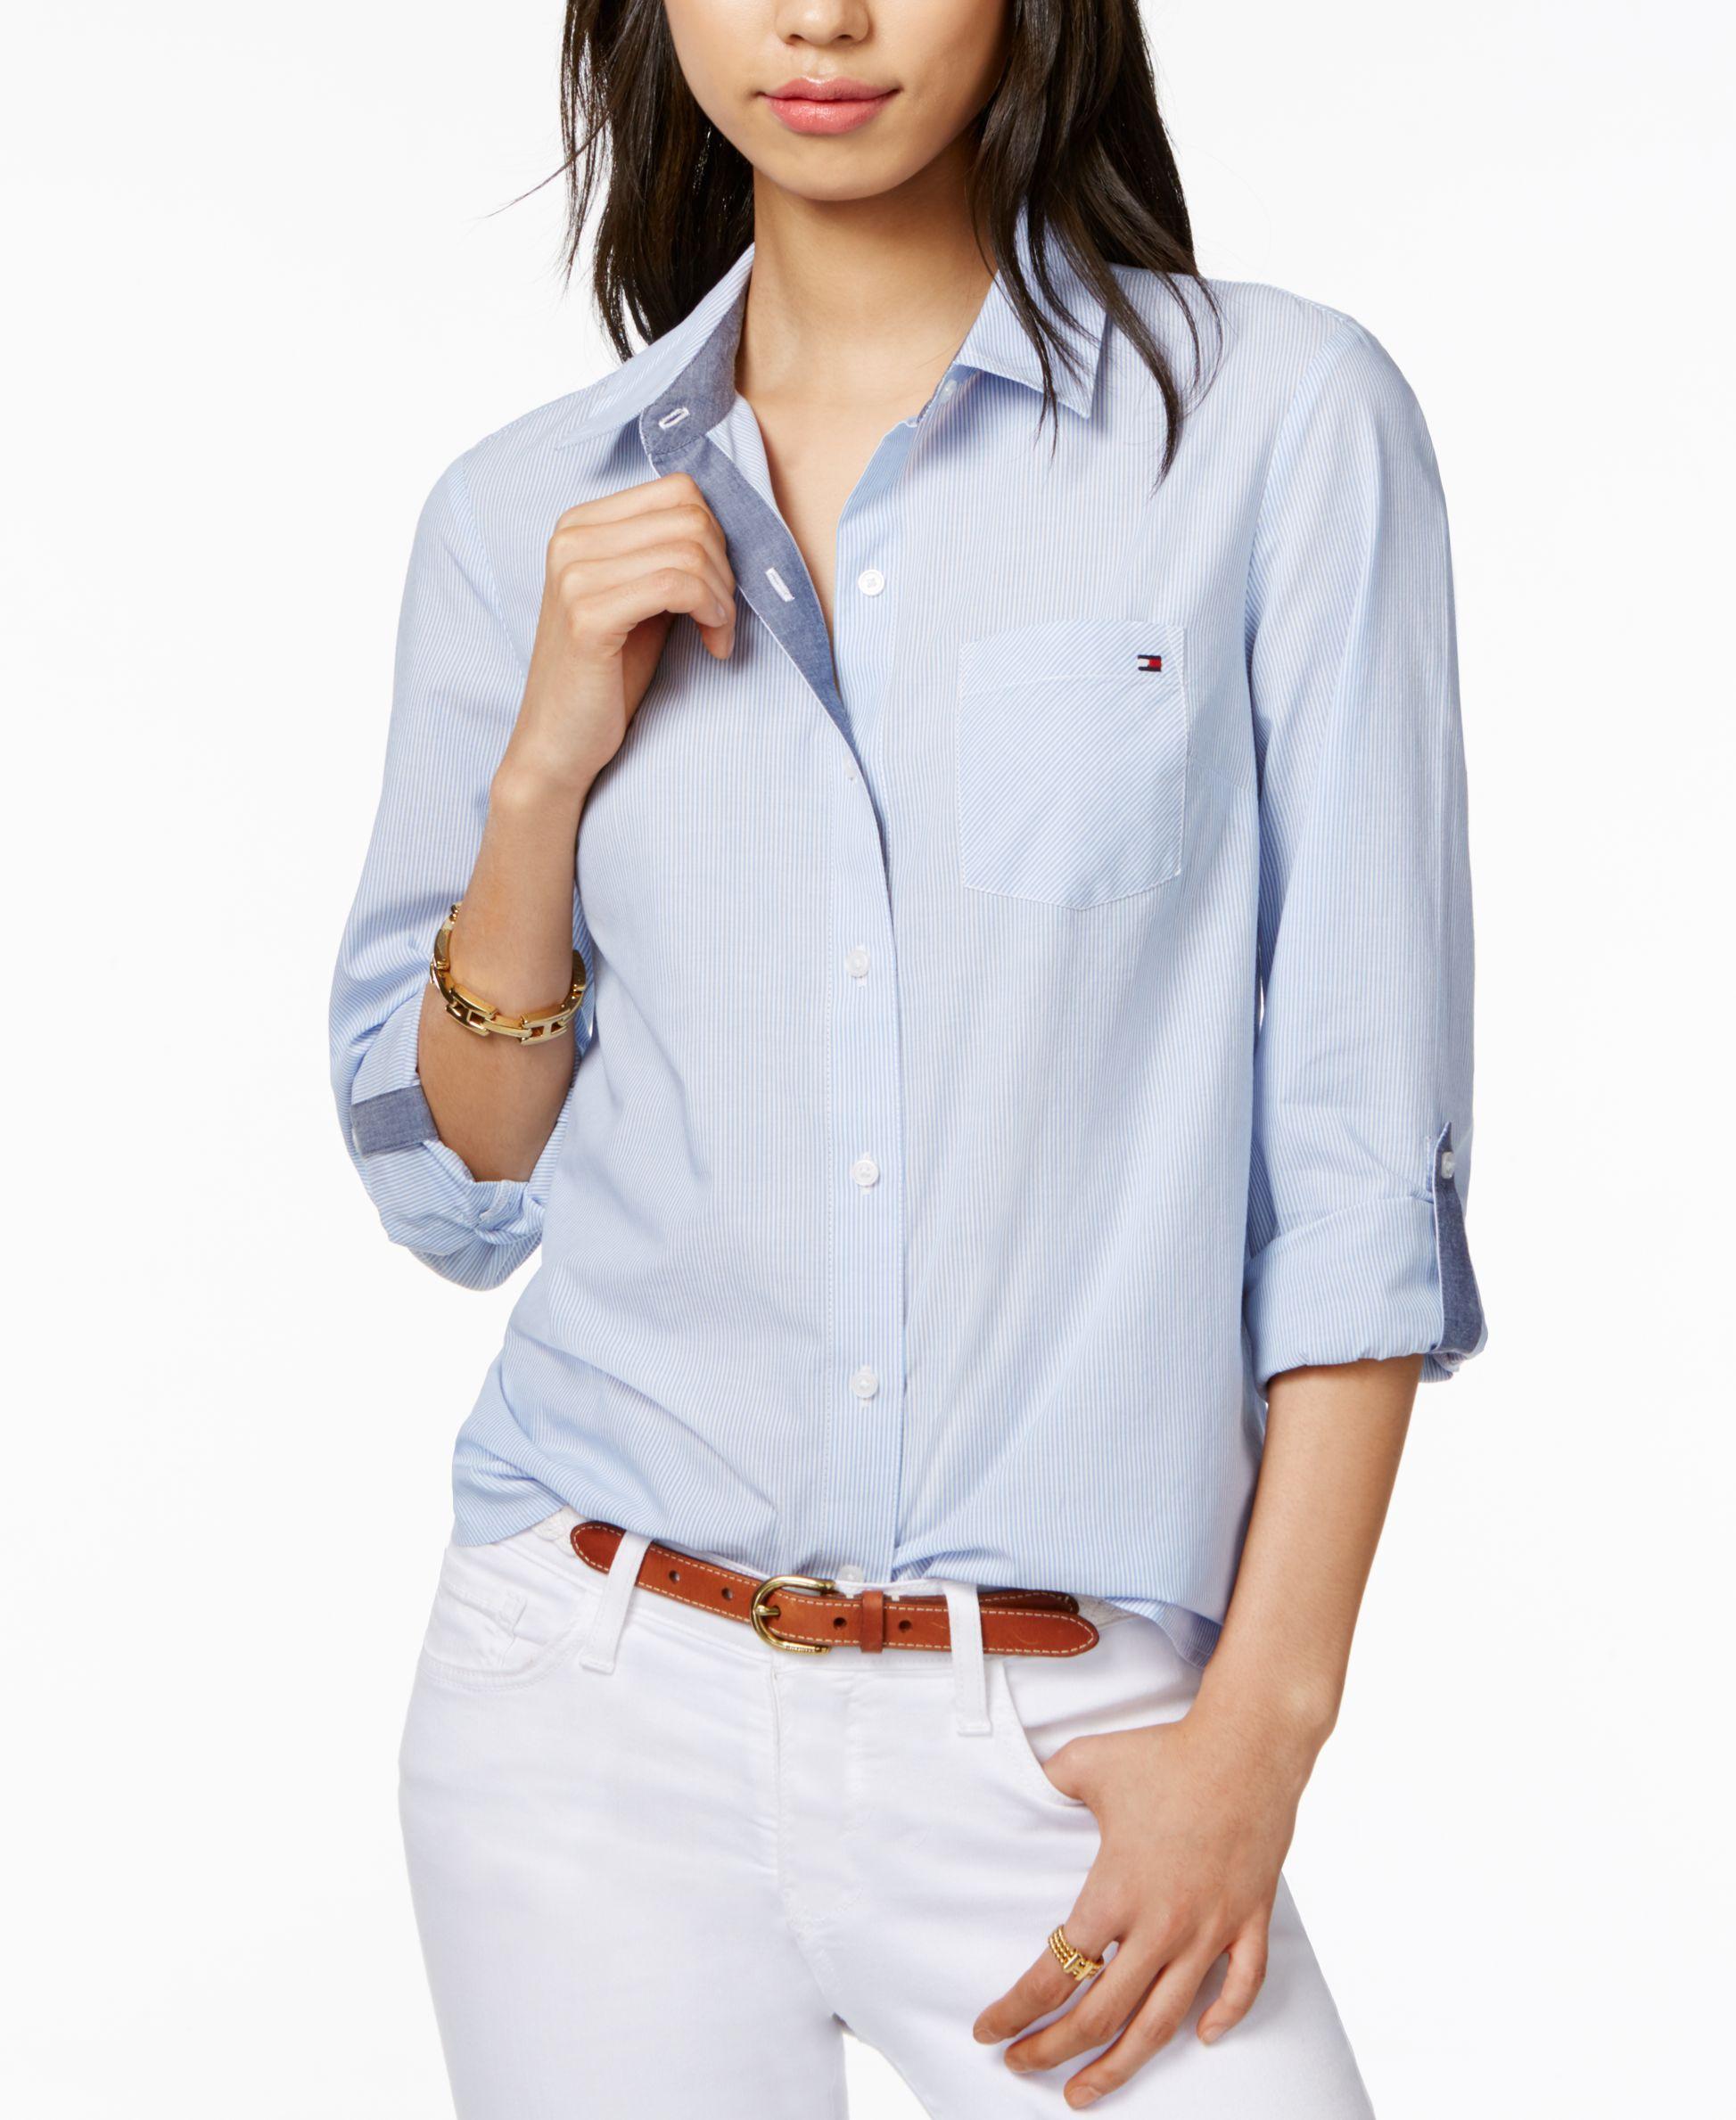 bacccf39e Tommy Hilfiger Cotton Pinstripe Shirt